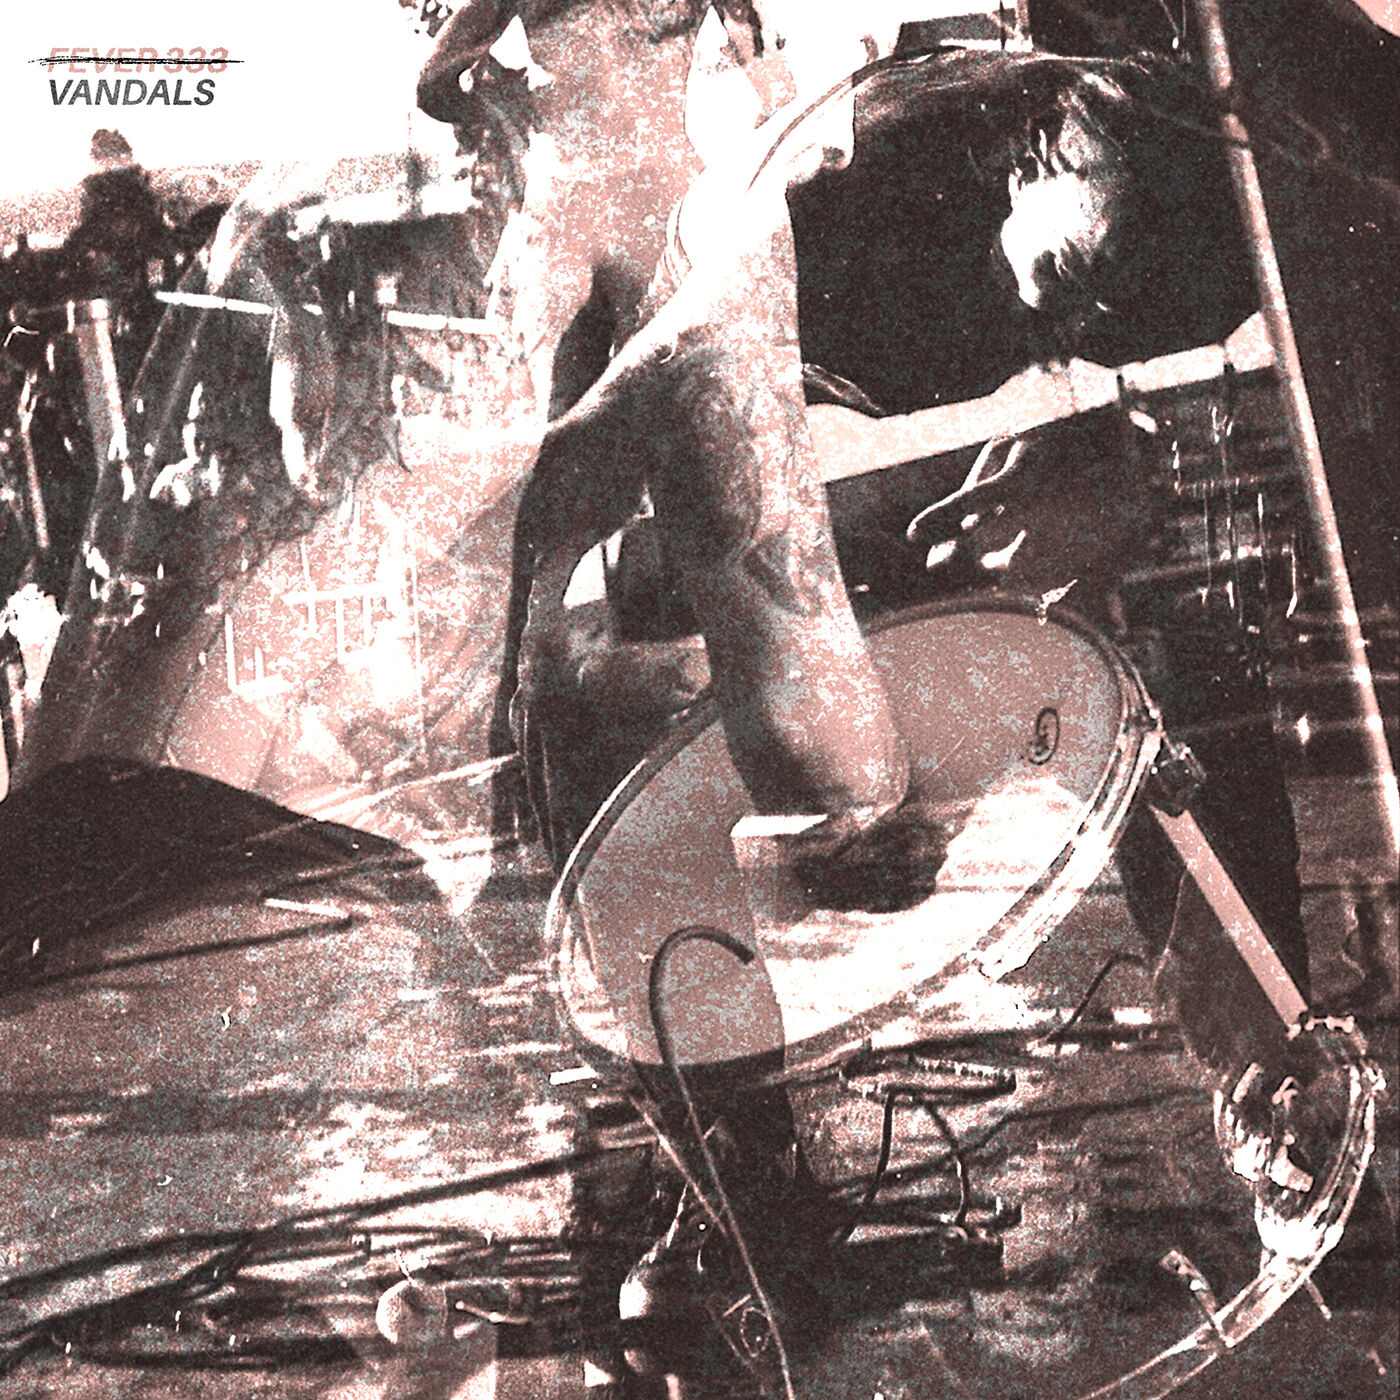 FEVER 333 - VANDALS [single] (2019)